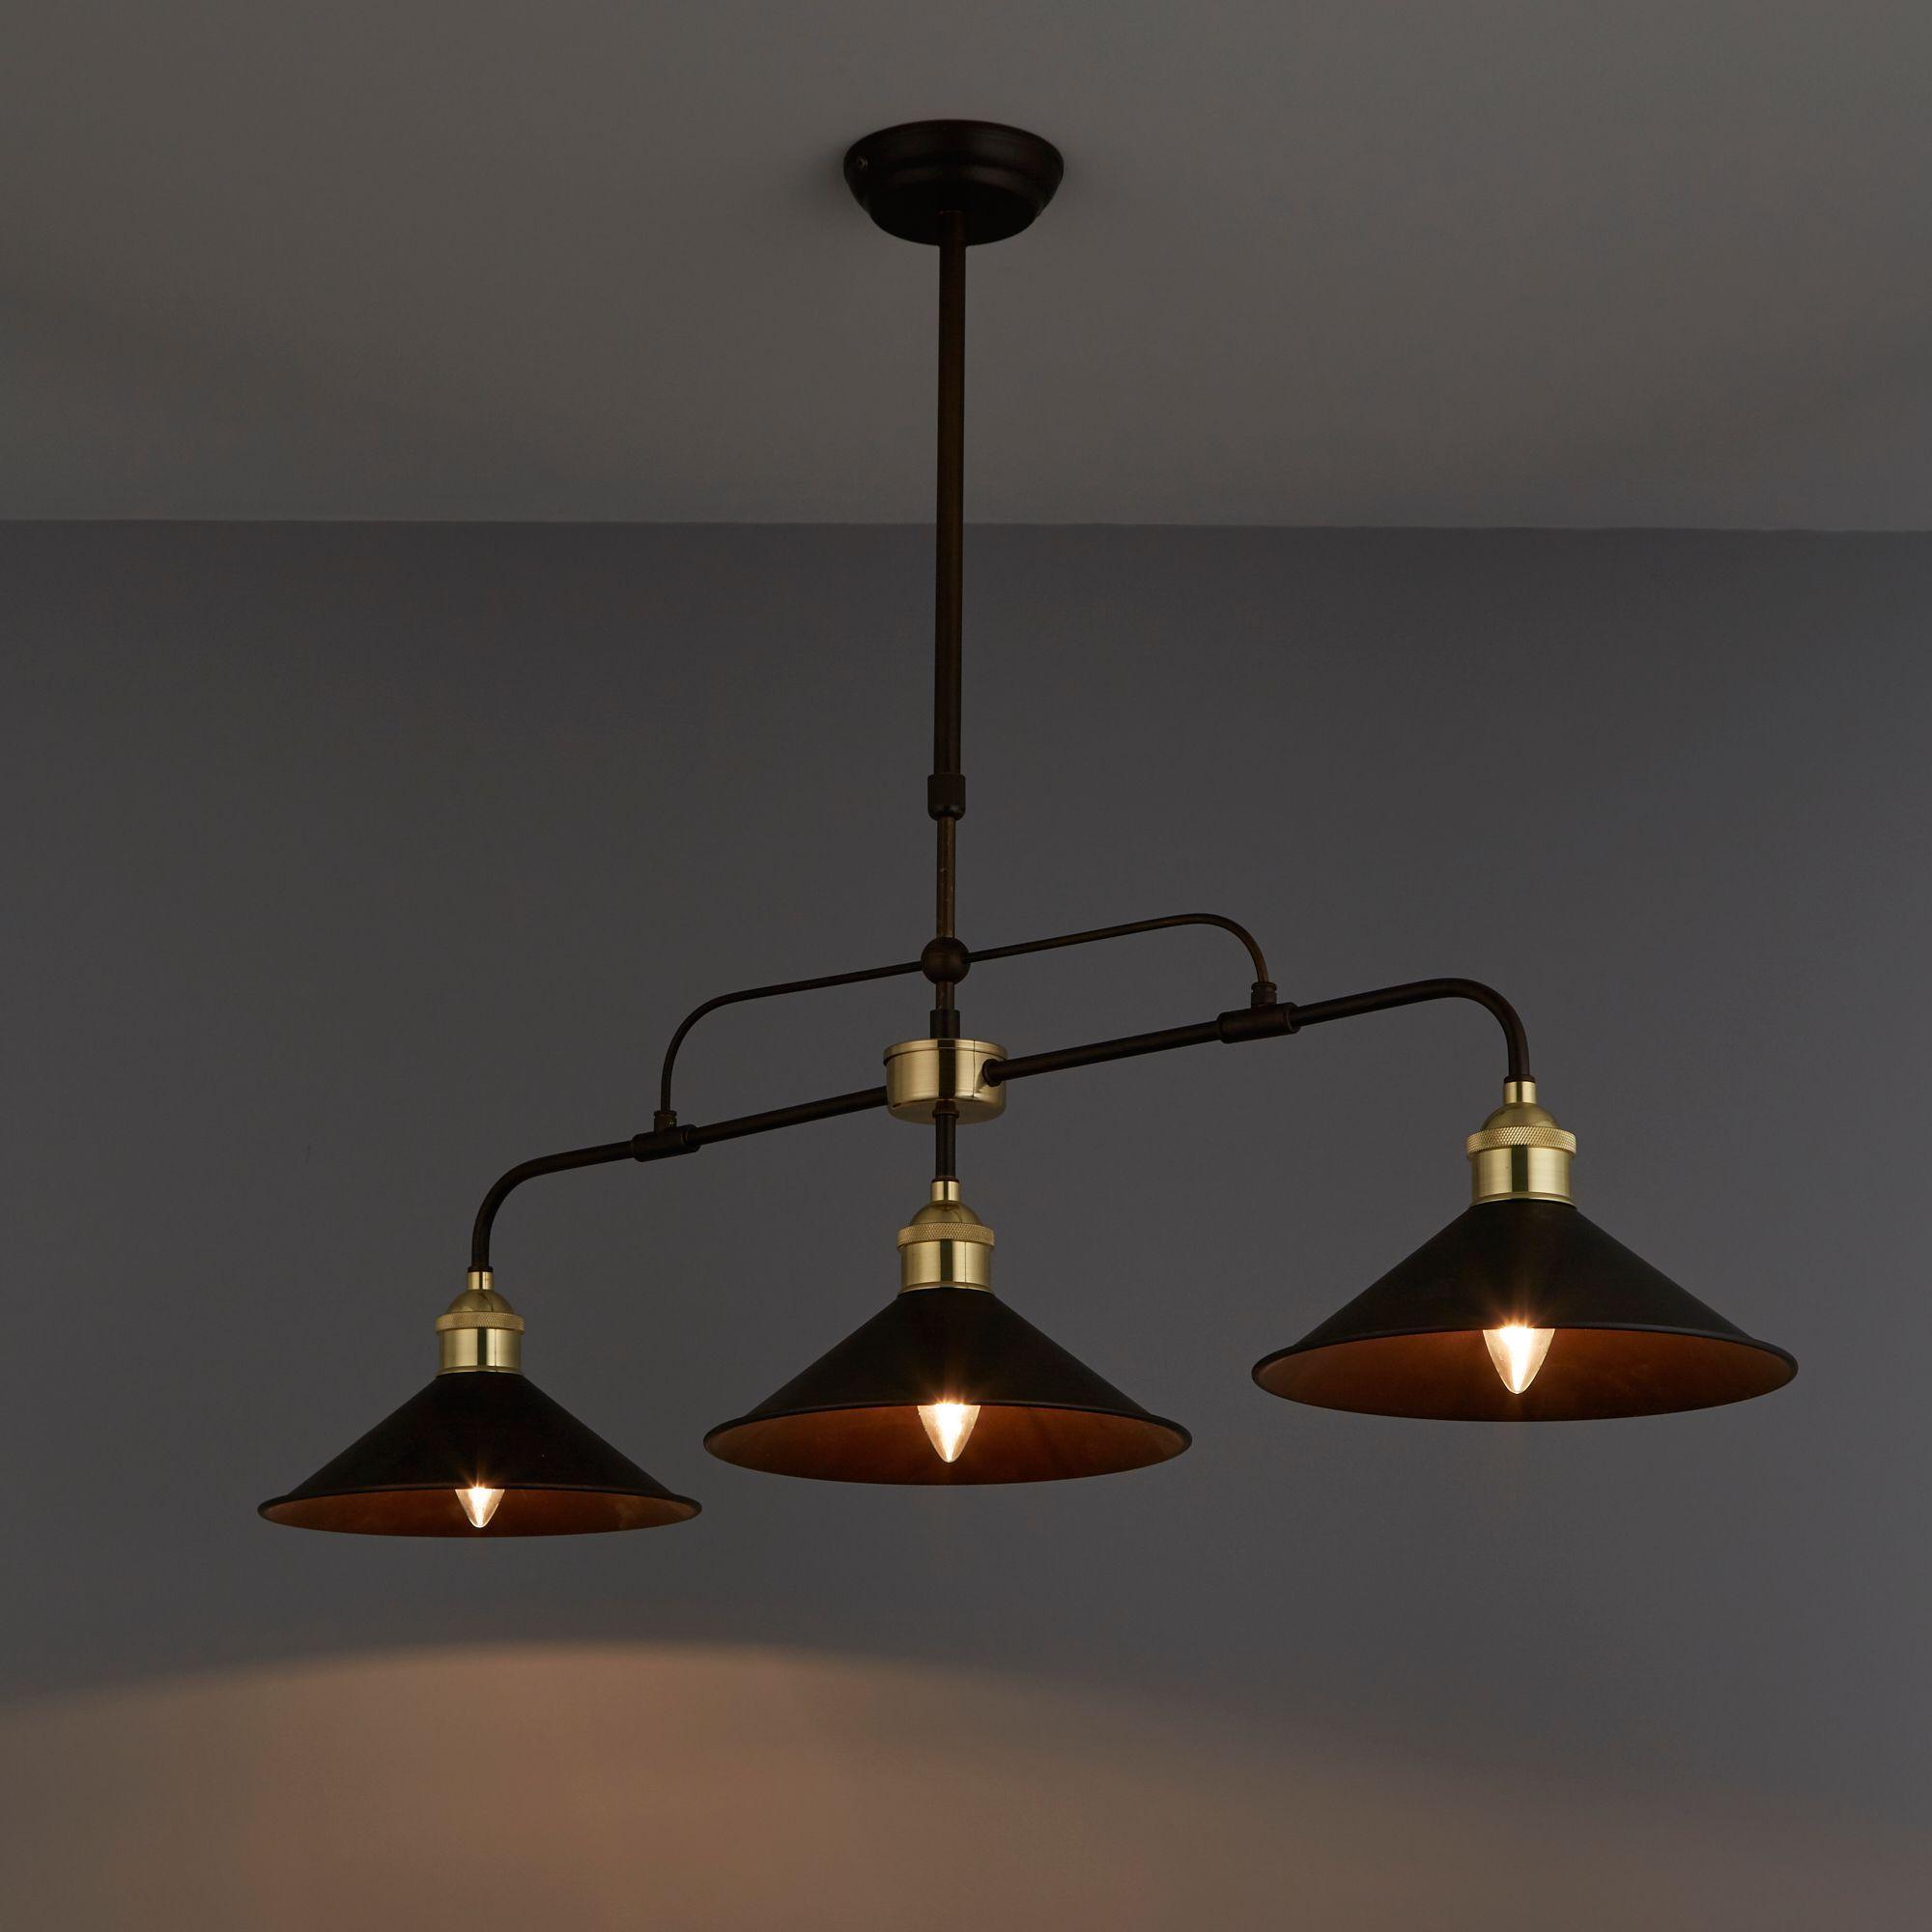 alfie bronze effect  lamp pendant ceiling light departments diy  bq